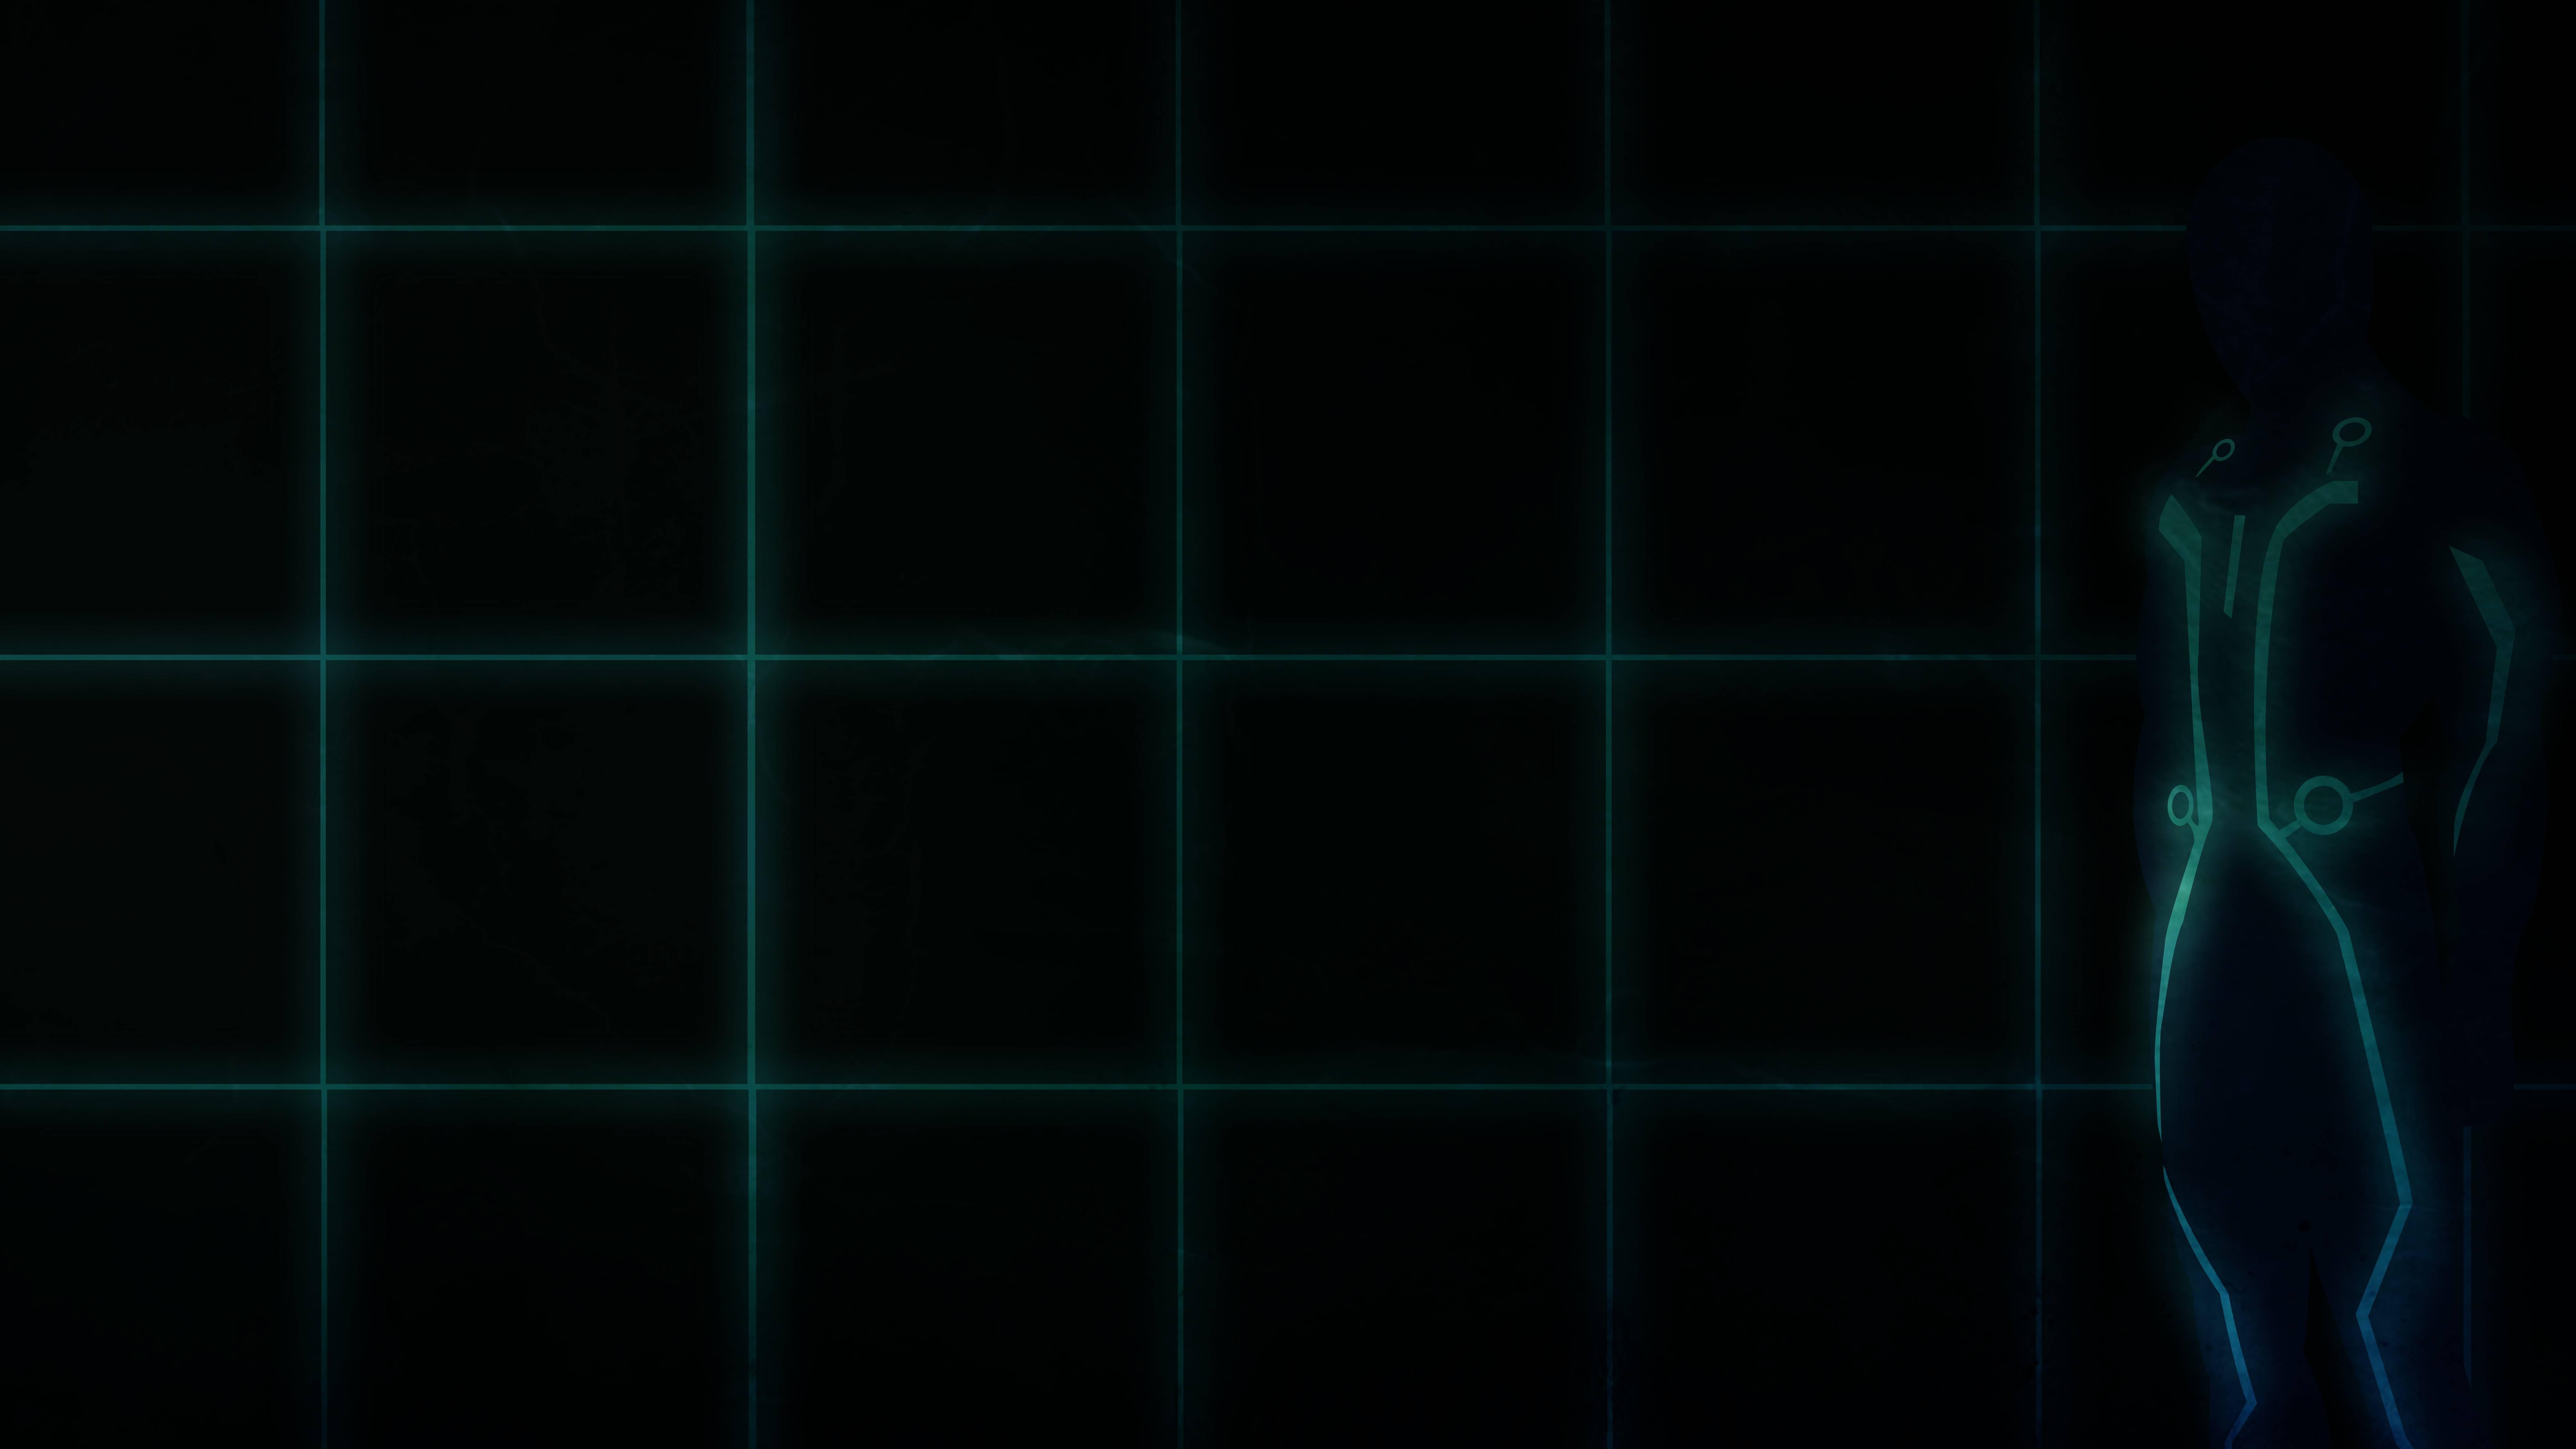 Tron Legacy Background (Sam Flynn Light Suit) - Imgur